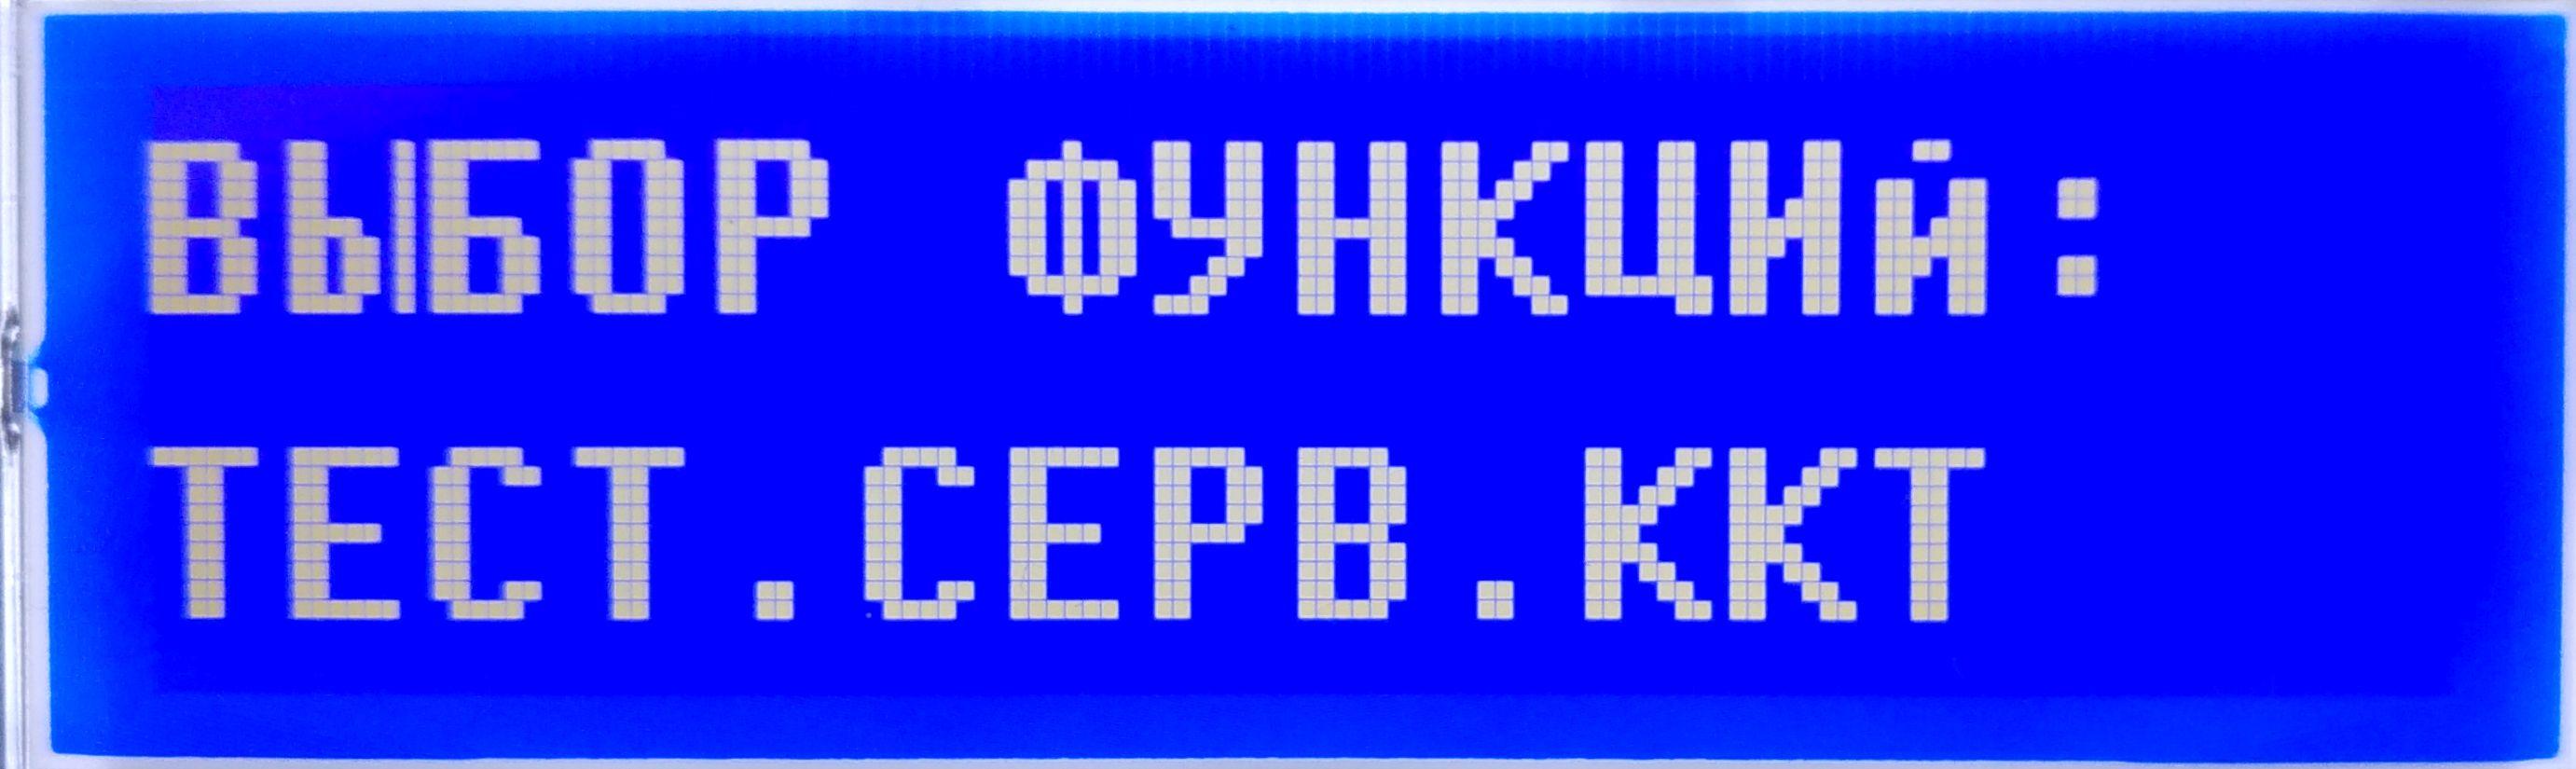 Онлайн-касса Меркурий (115Ф, 130Ф, 180Ф, 185Ф) - функция тестирования сервера ККТ